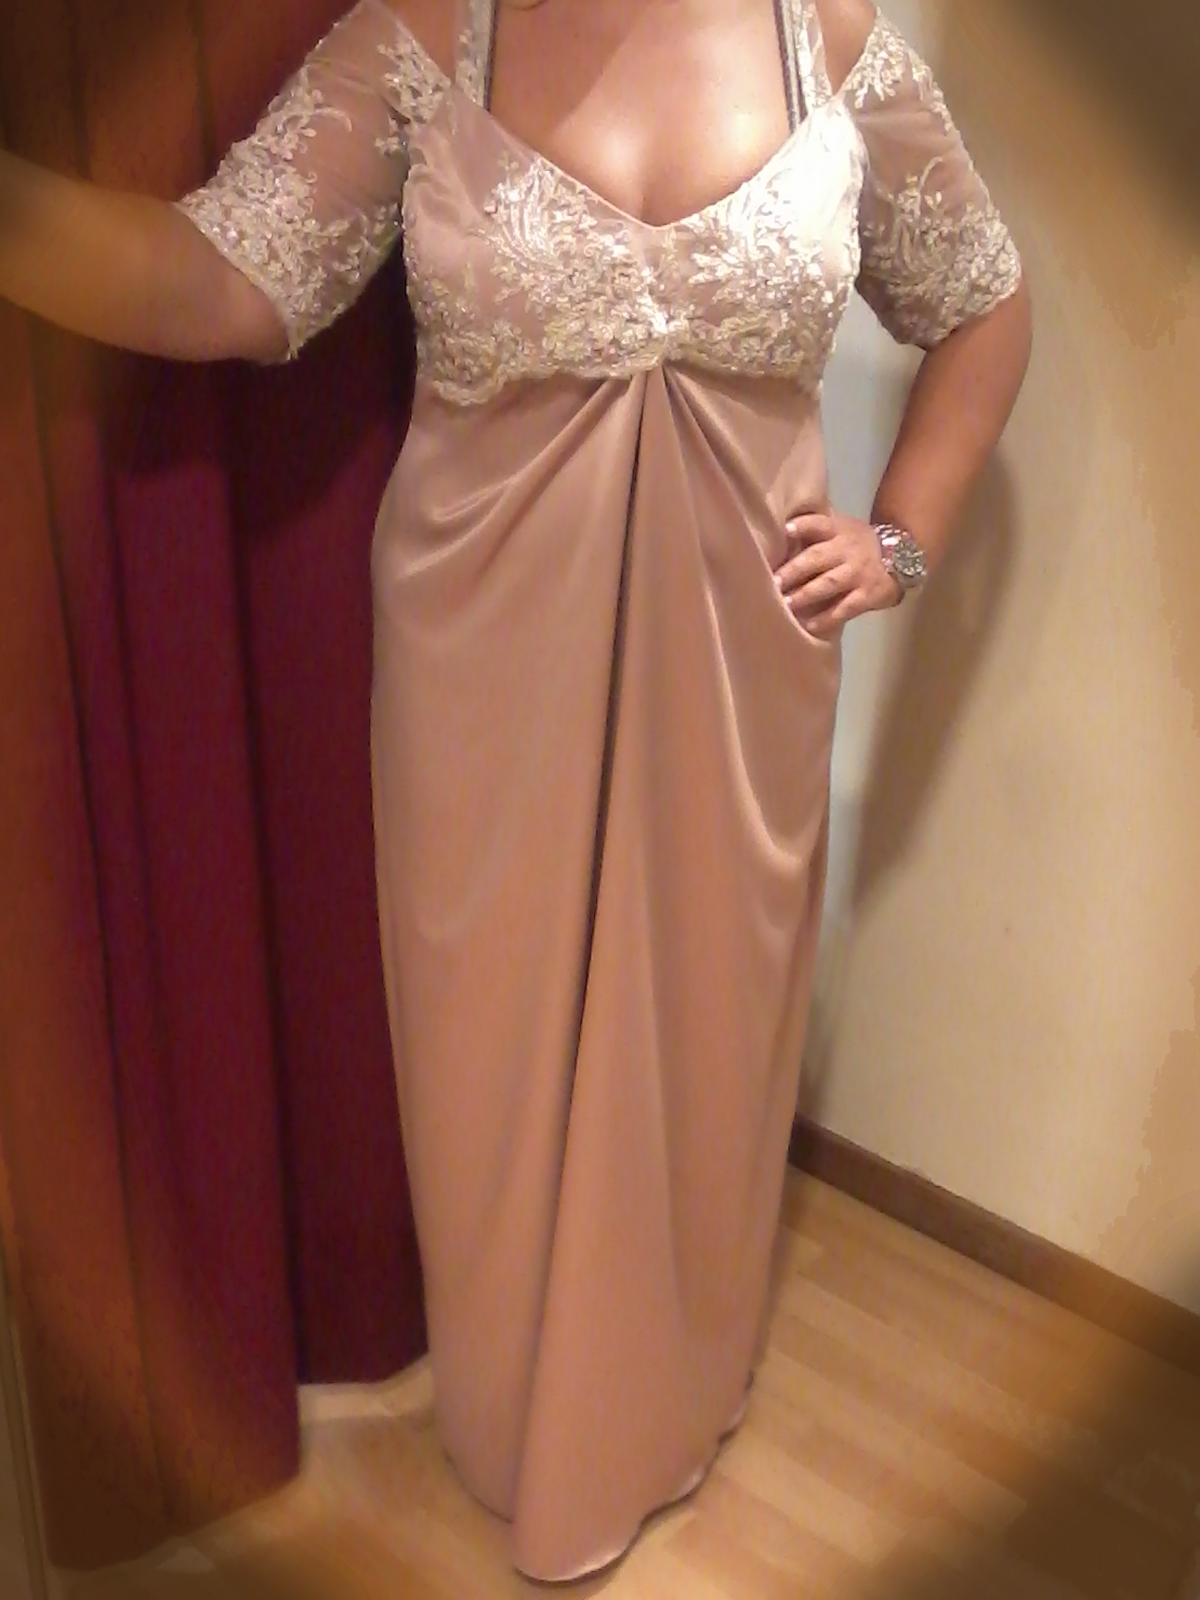 9cdffb665b17 Επίσημα βραδινά φορέματα κατά παραγγελία στο Περιστέρι Dresses Plus Size -  www.modistres.gr